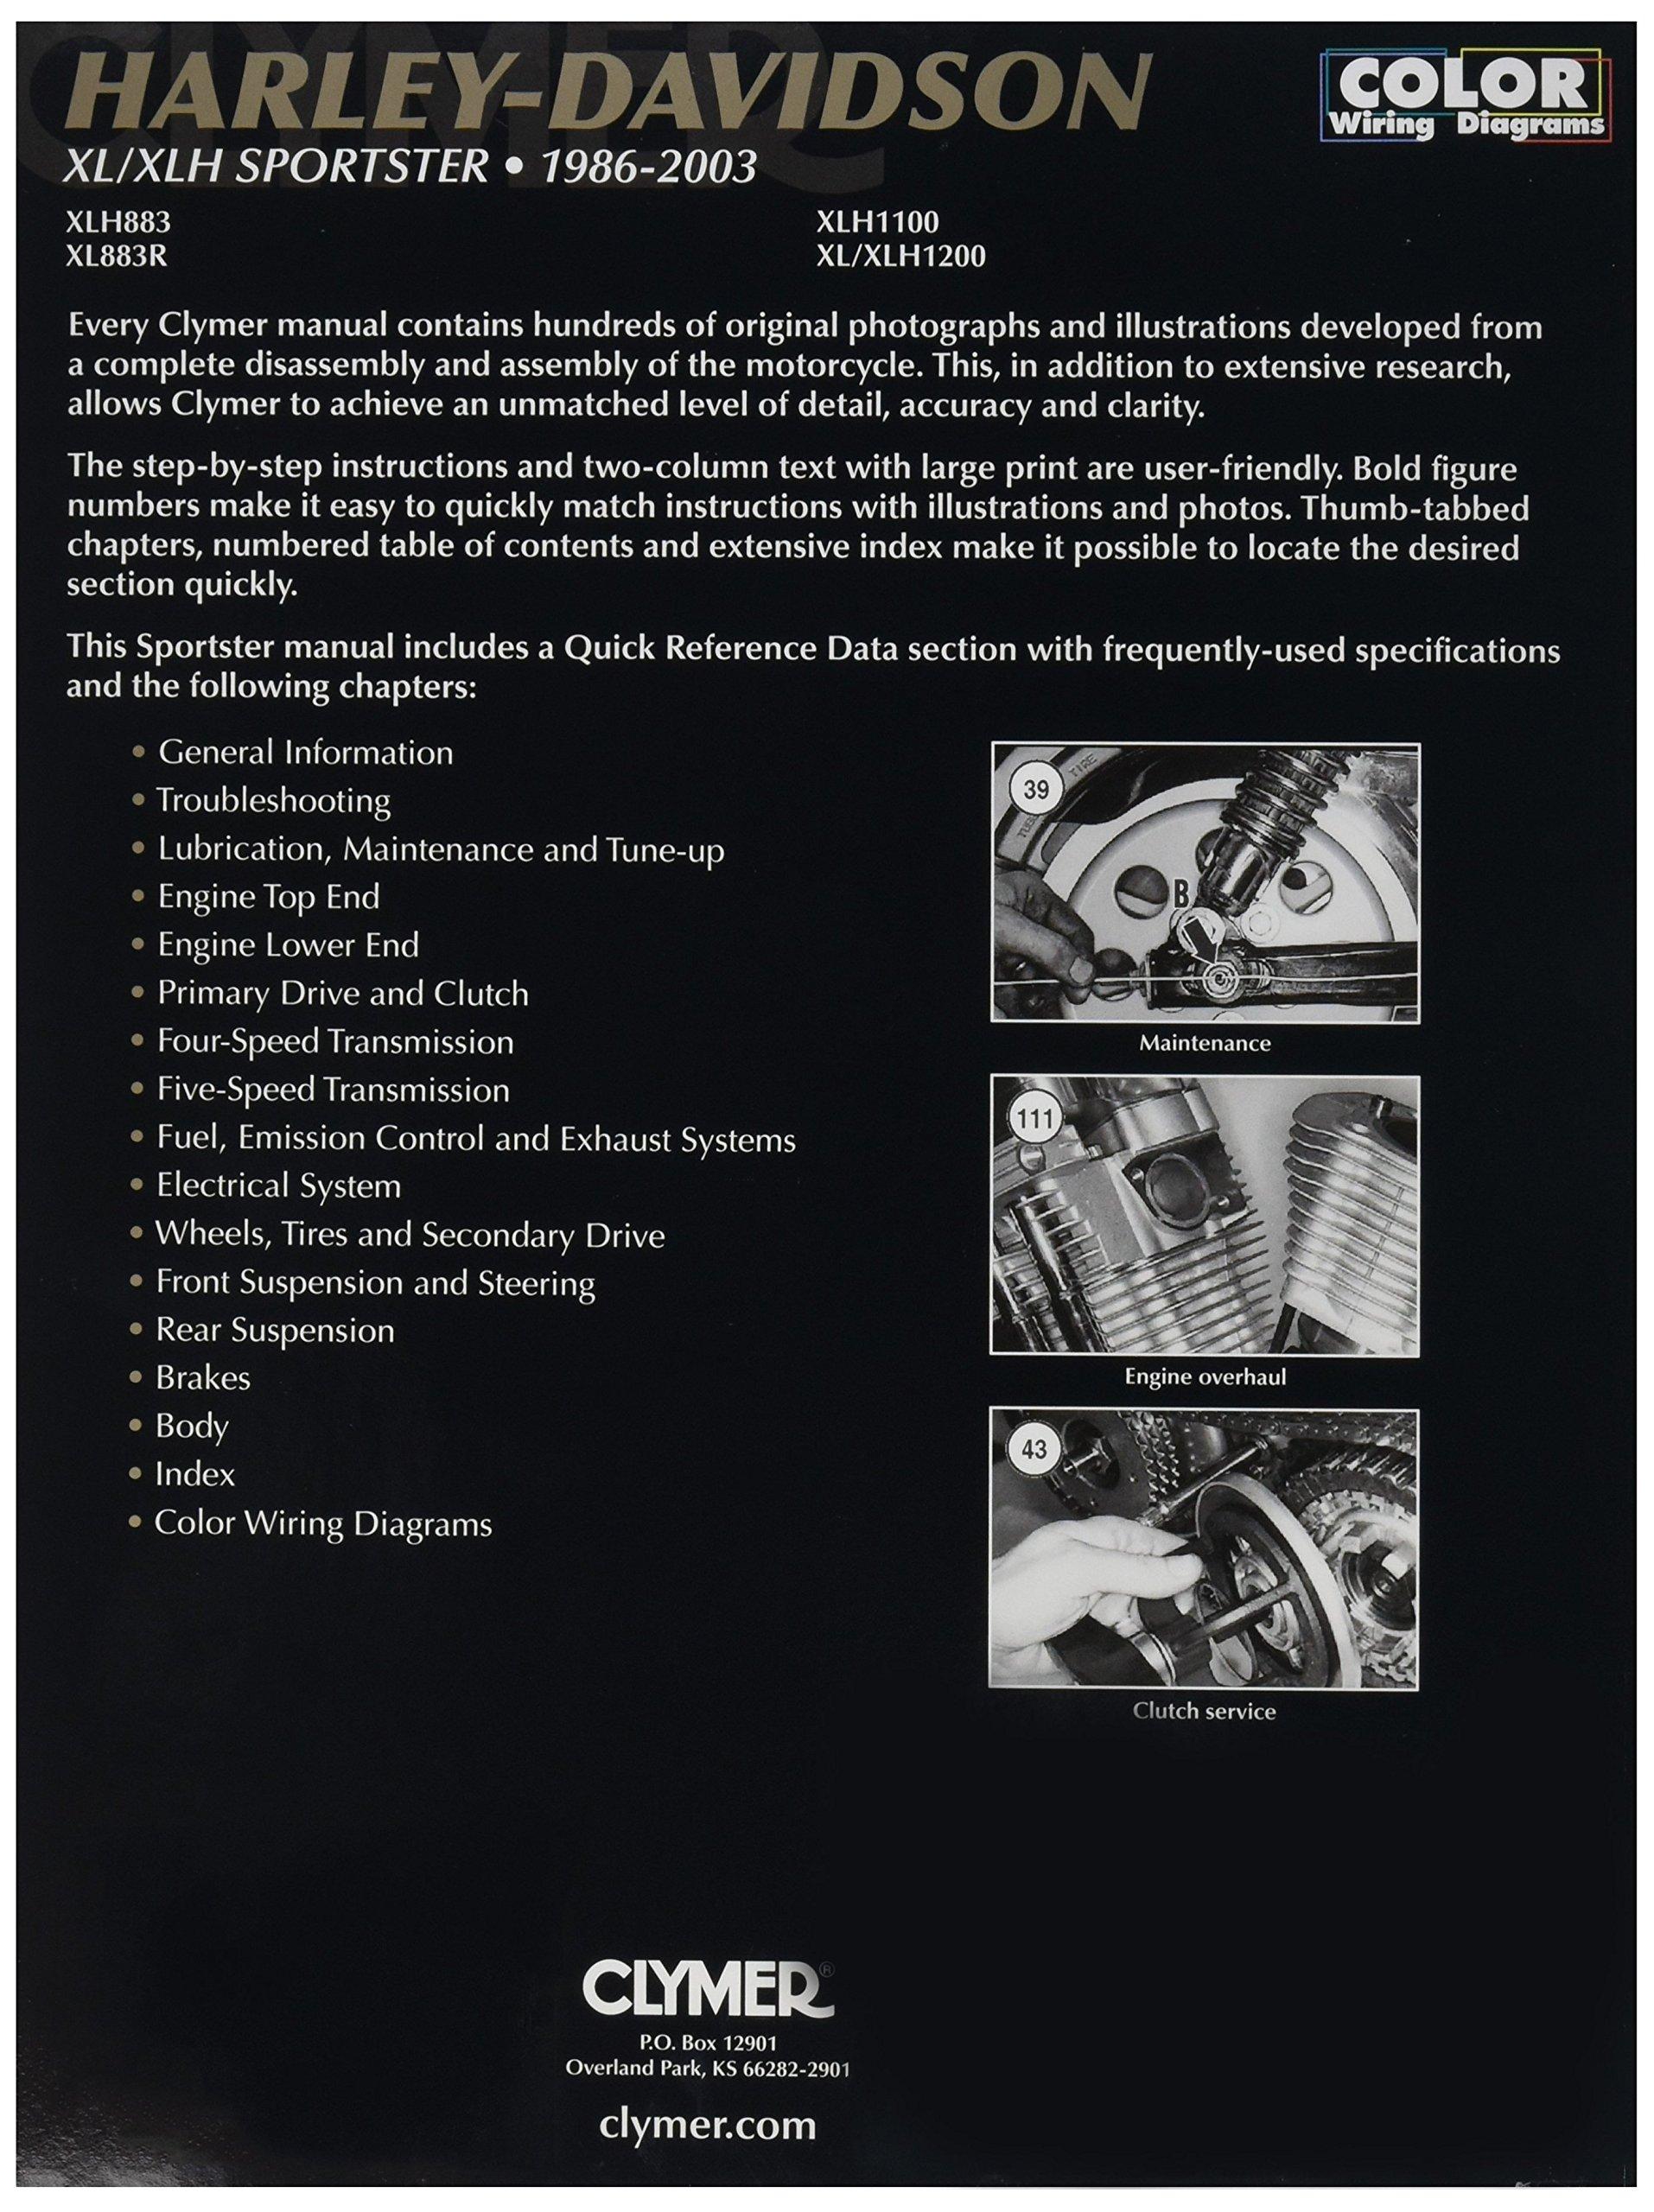 Clymer Harley Davidson XL Sportster (04-06) Manual M427-1 by Clymer (Image #2)